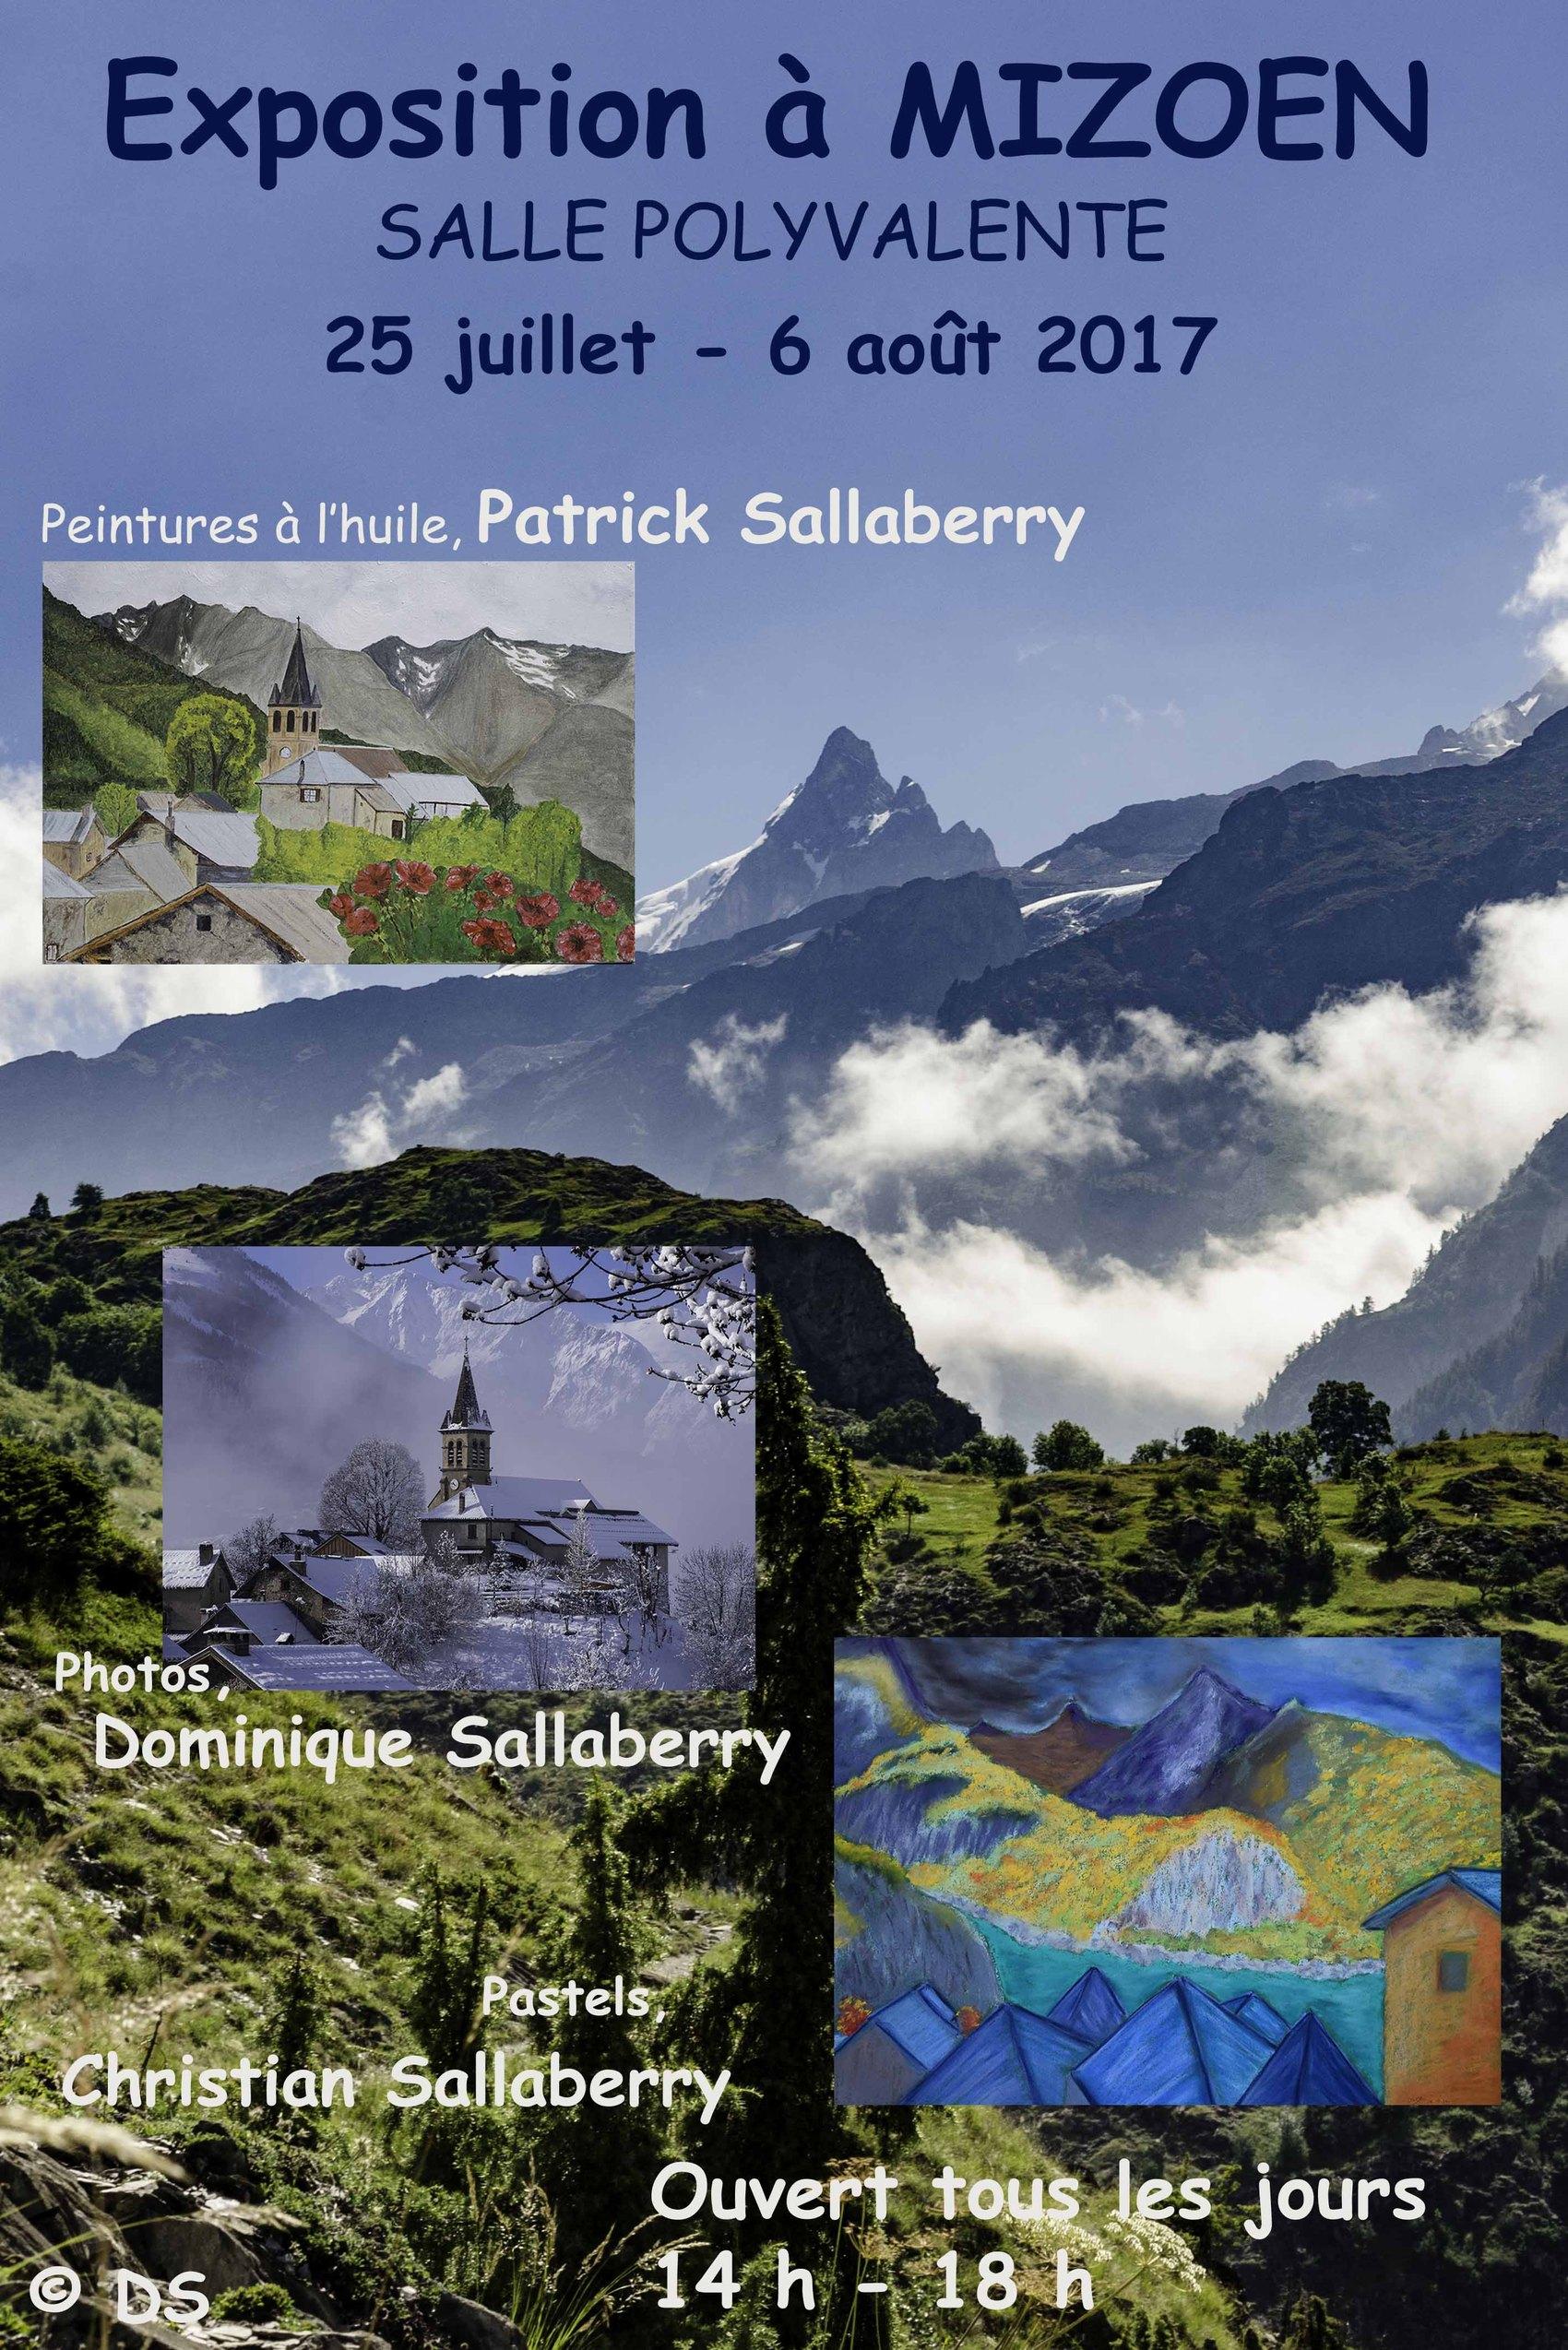 Peintures et photos Sallaberry